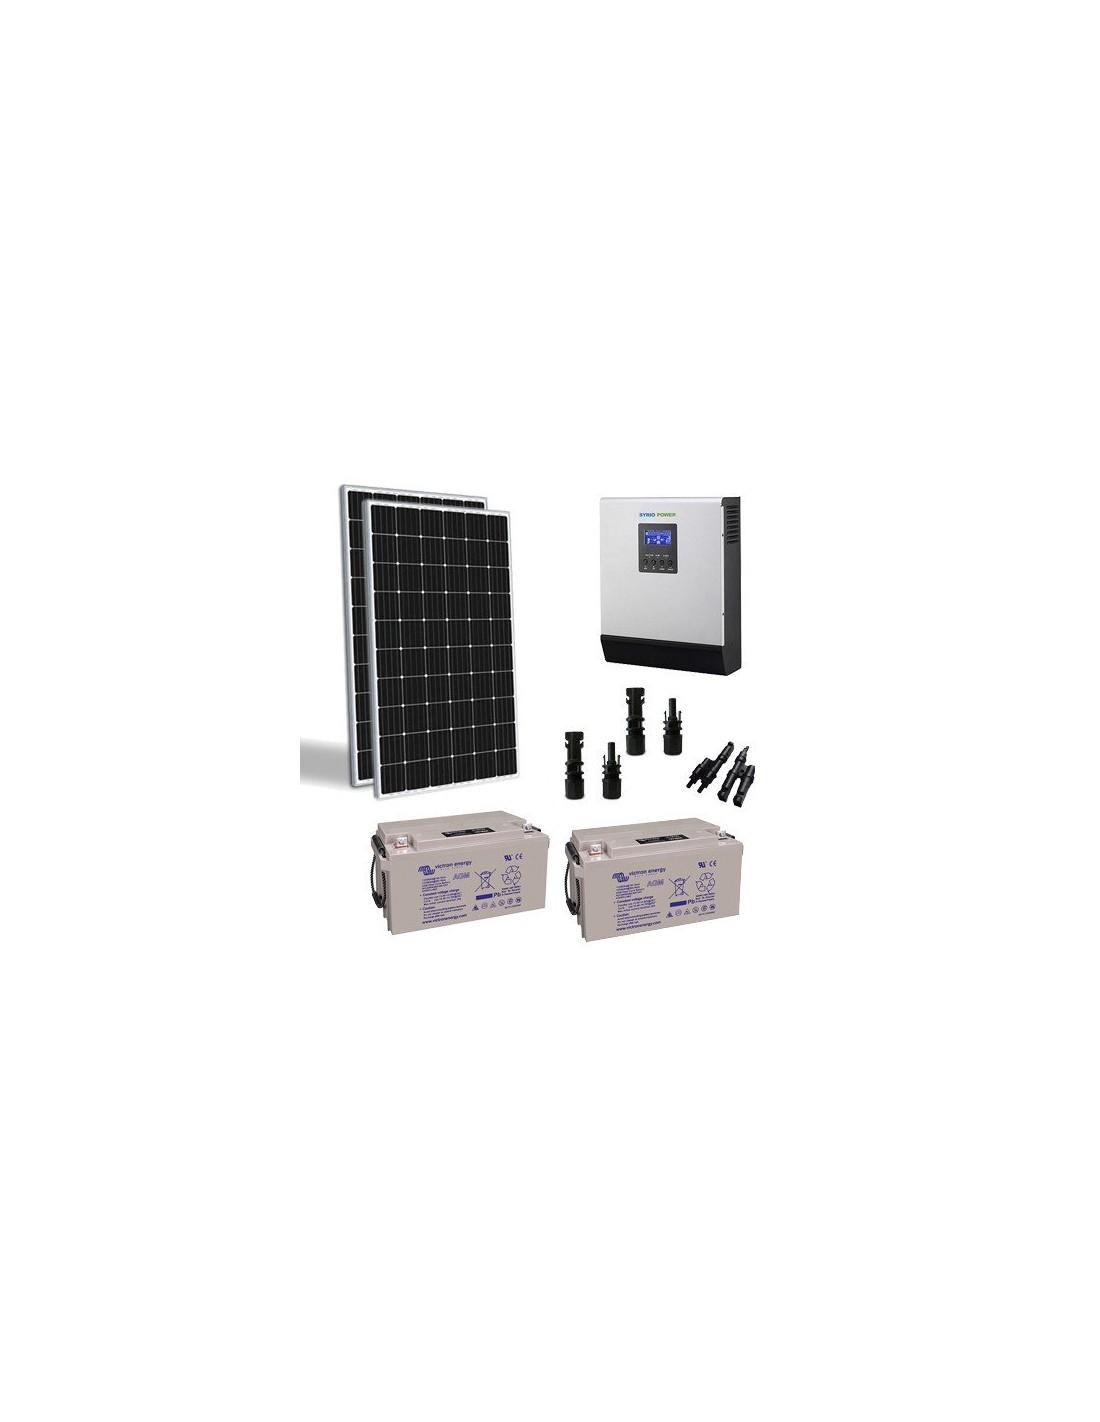 Kit Pannello Solare Batteria Inverter : Kit solare baita w tr v pro pannello inverter